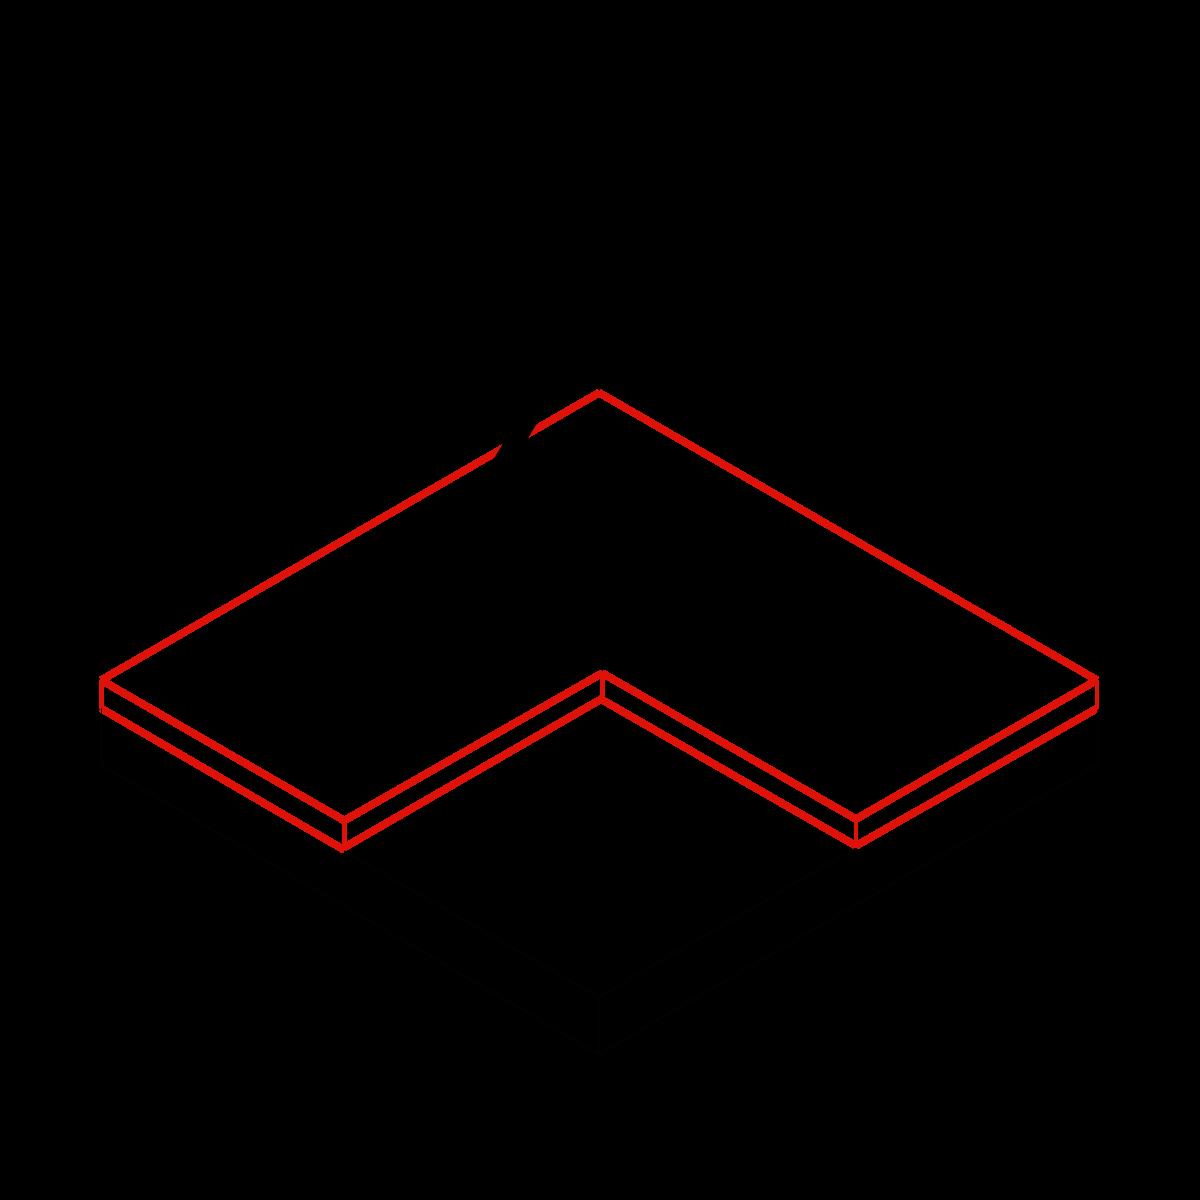 Piso antideslisate d1f49d76 0ec7 4c40 ab99 4f8f63bbf19f